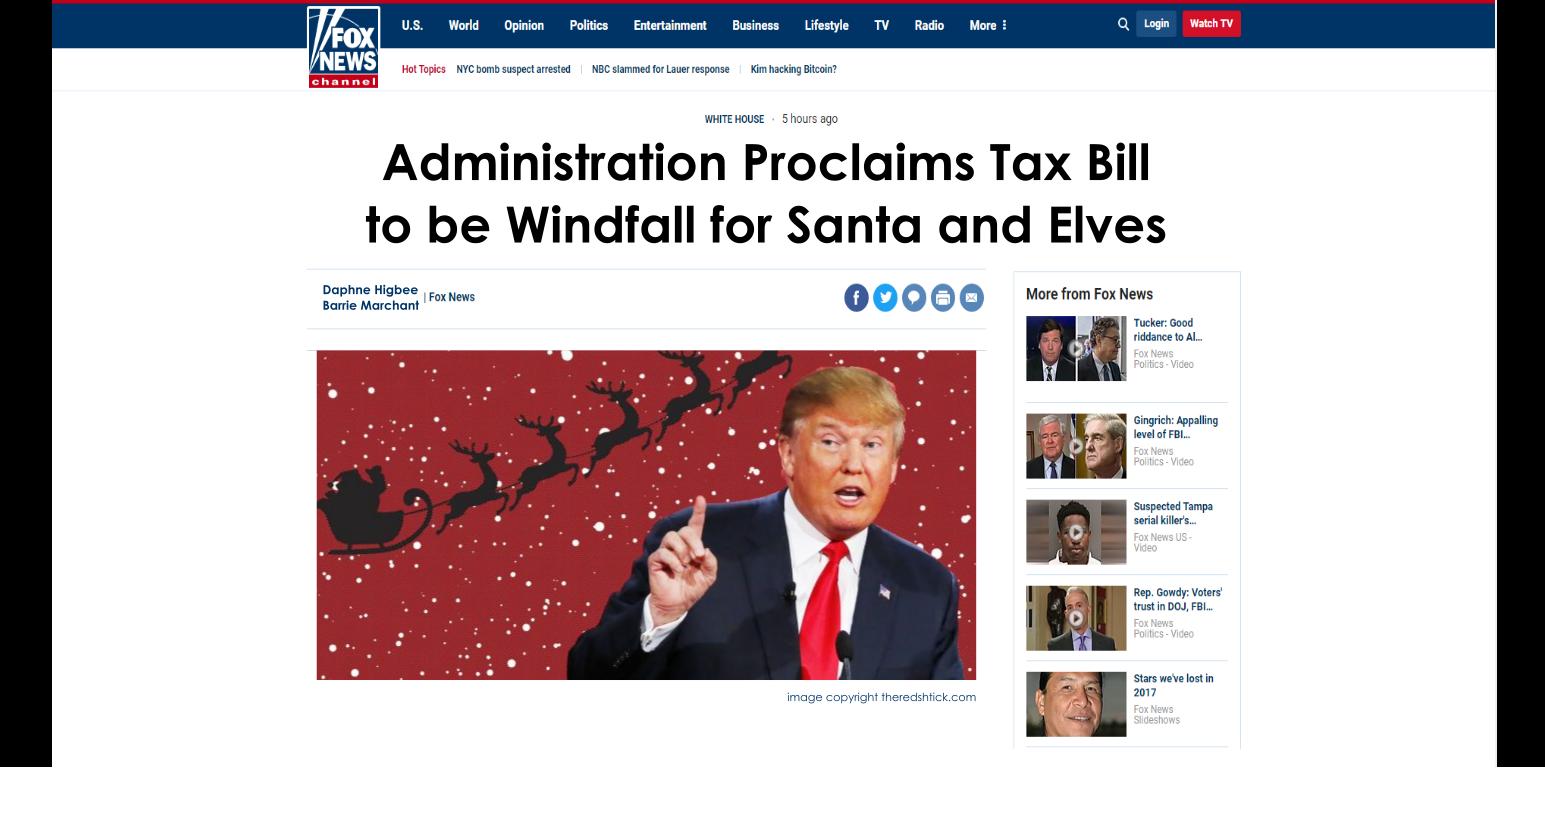 foxnewsheadline2017